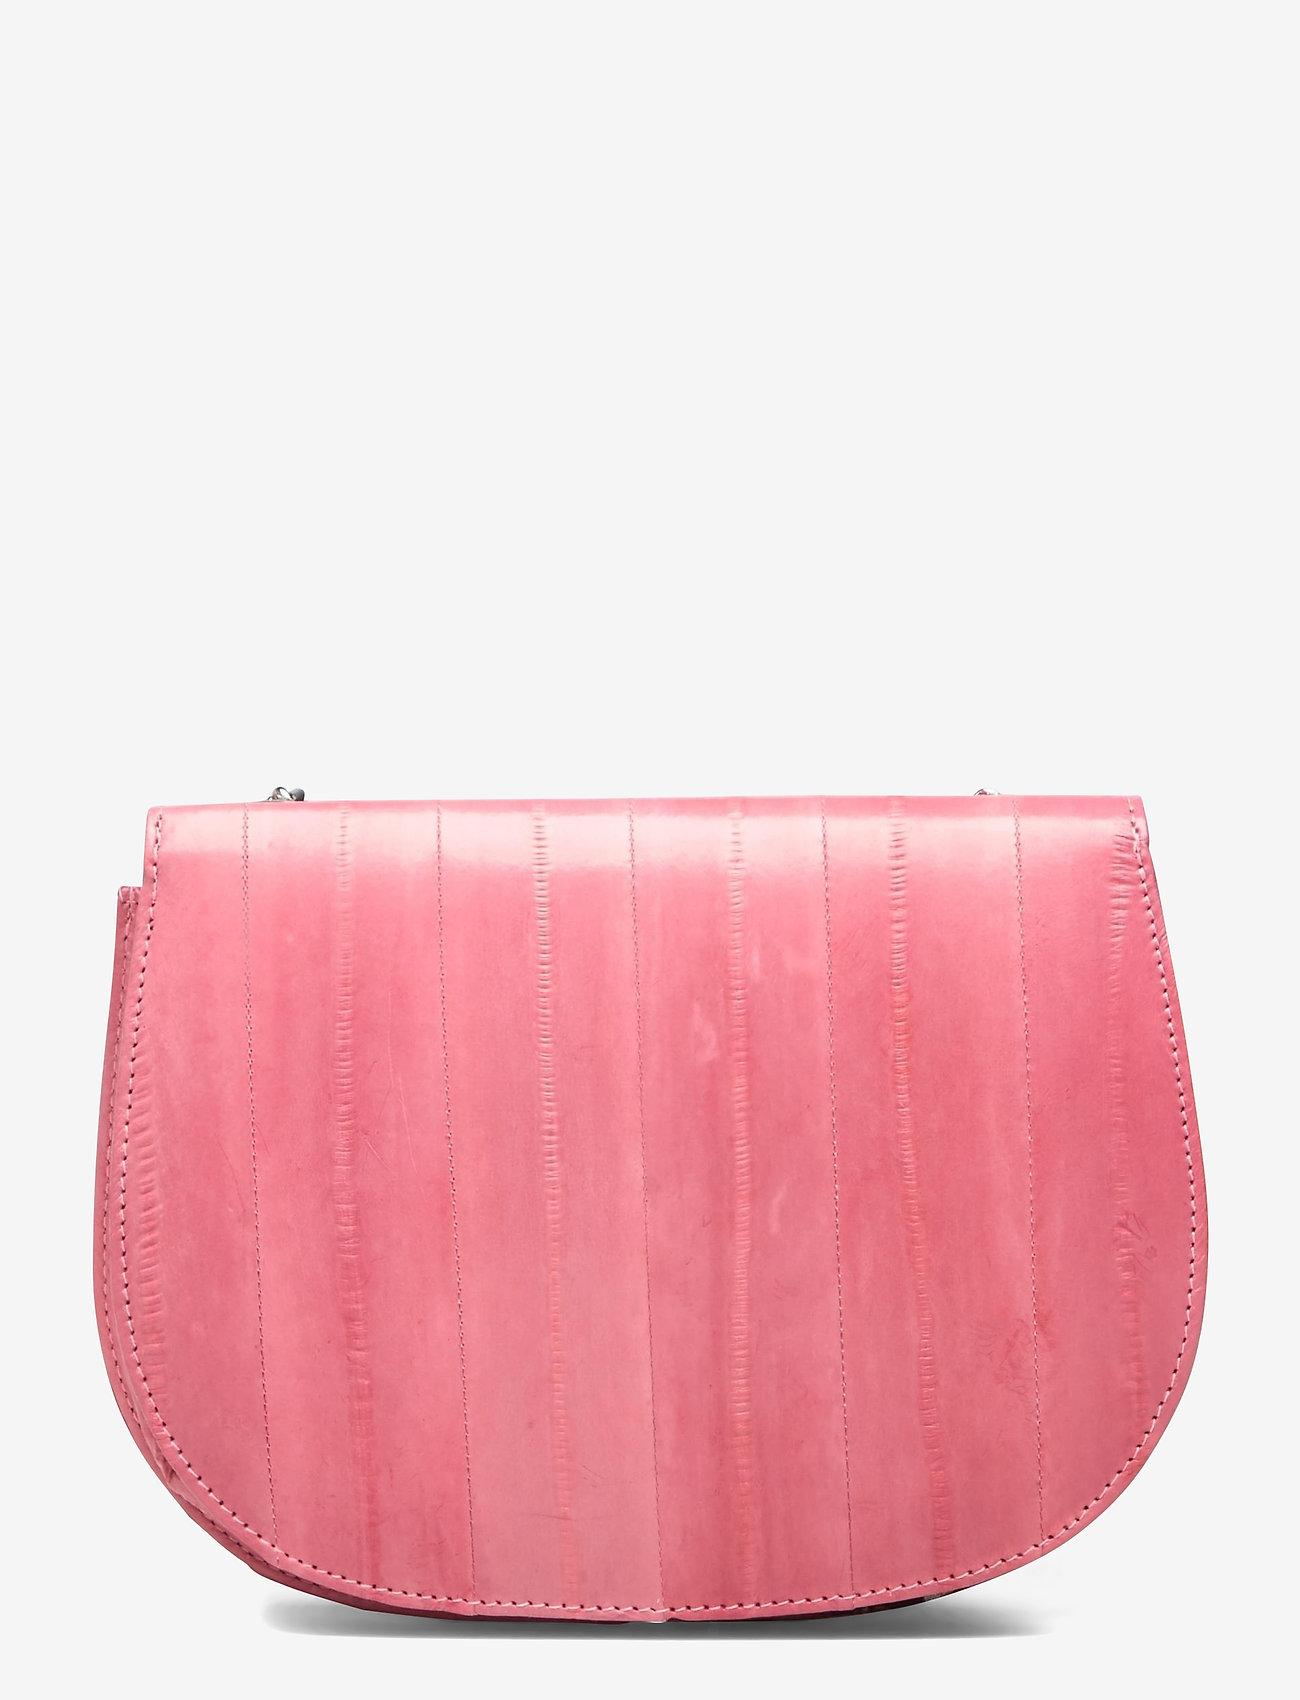 Becksöndergaard - Linda bag - torby na ramię - peach pink - 1